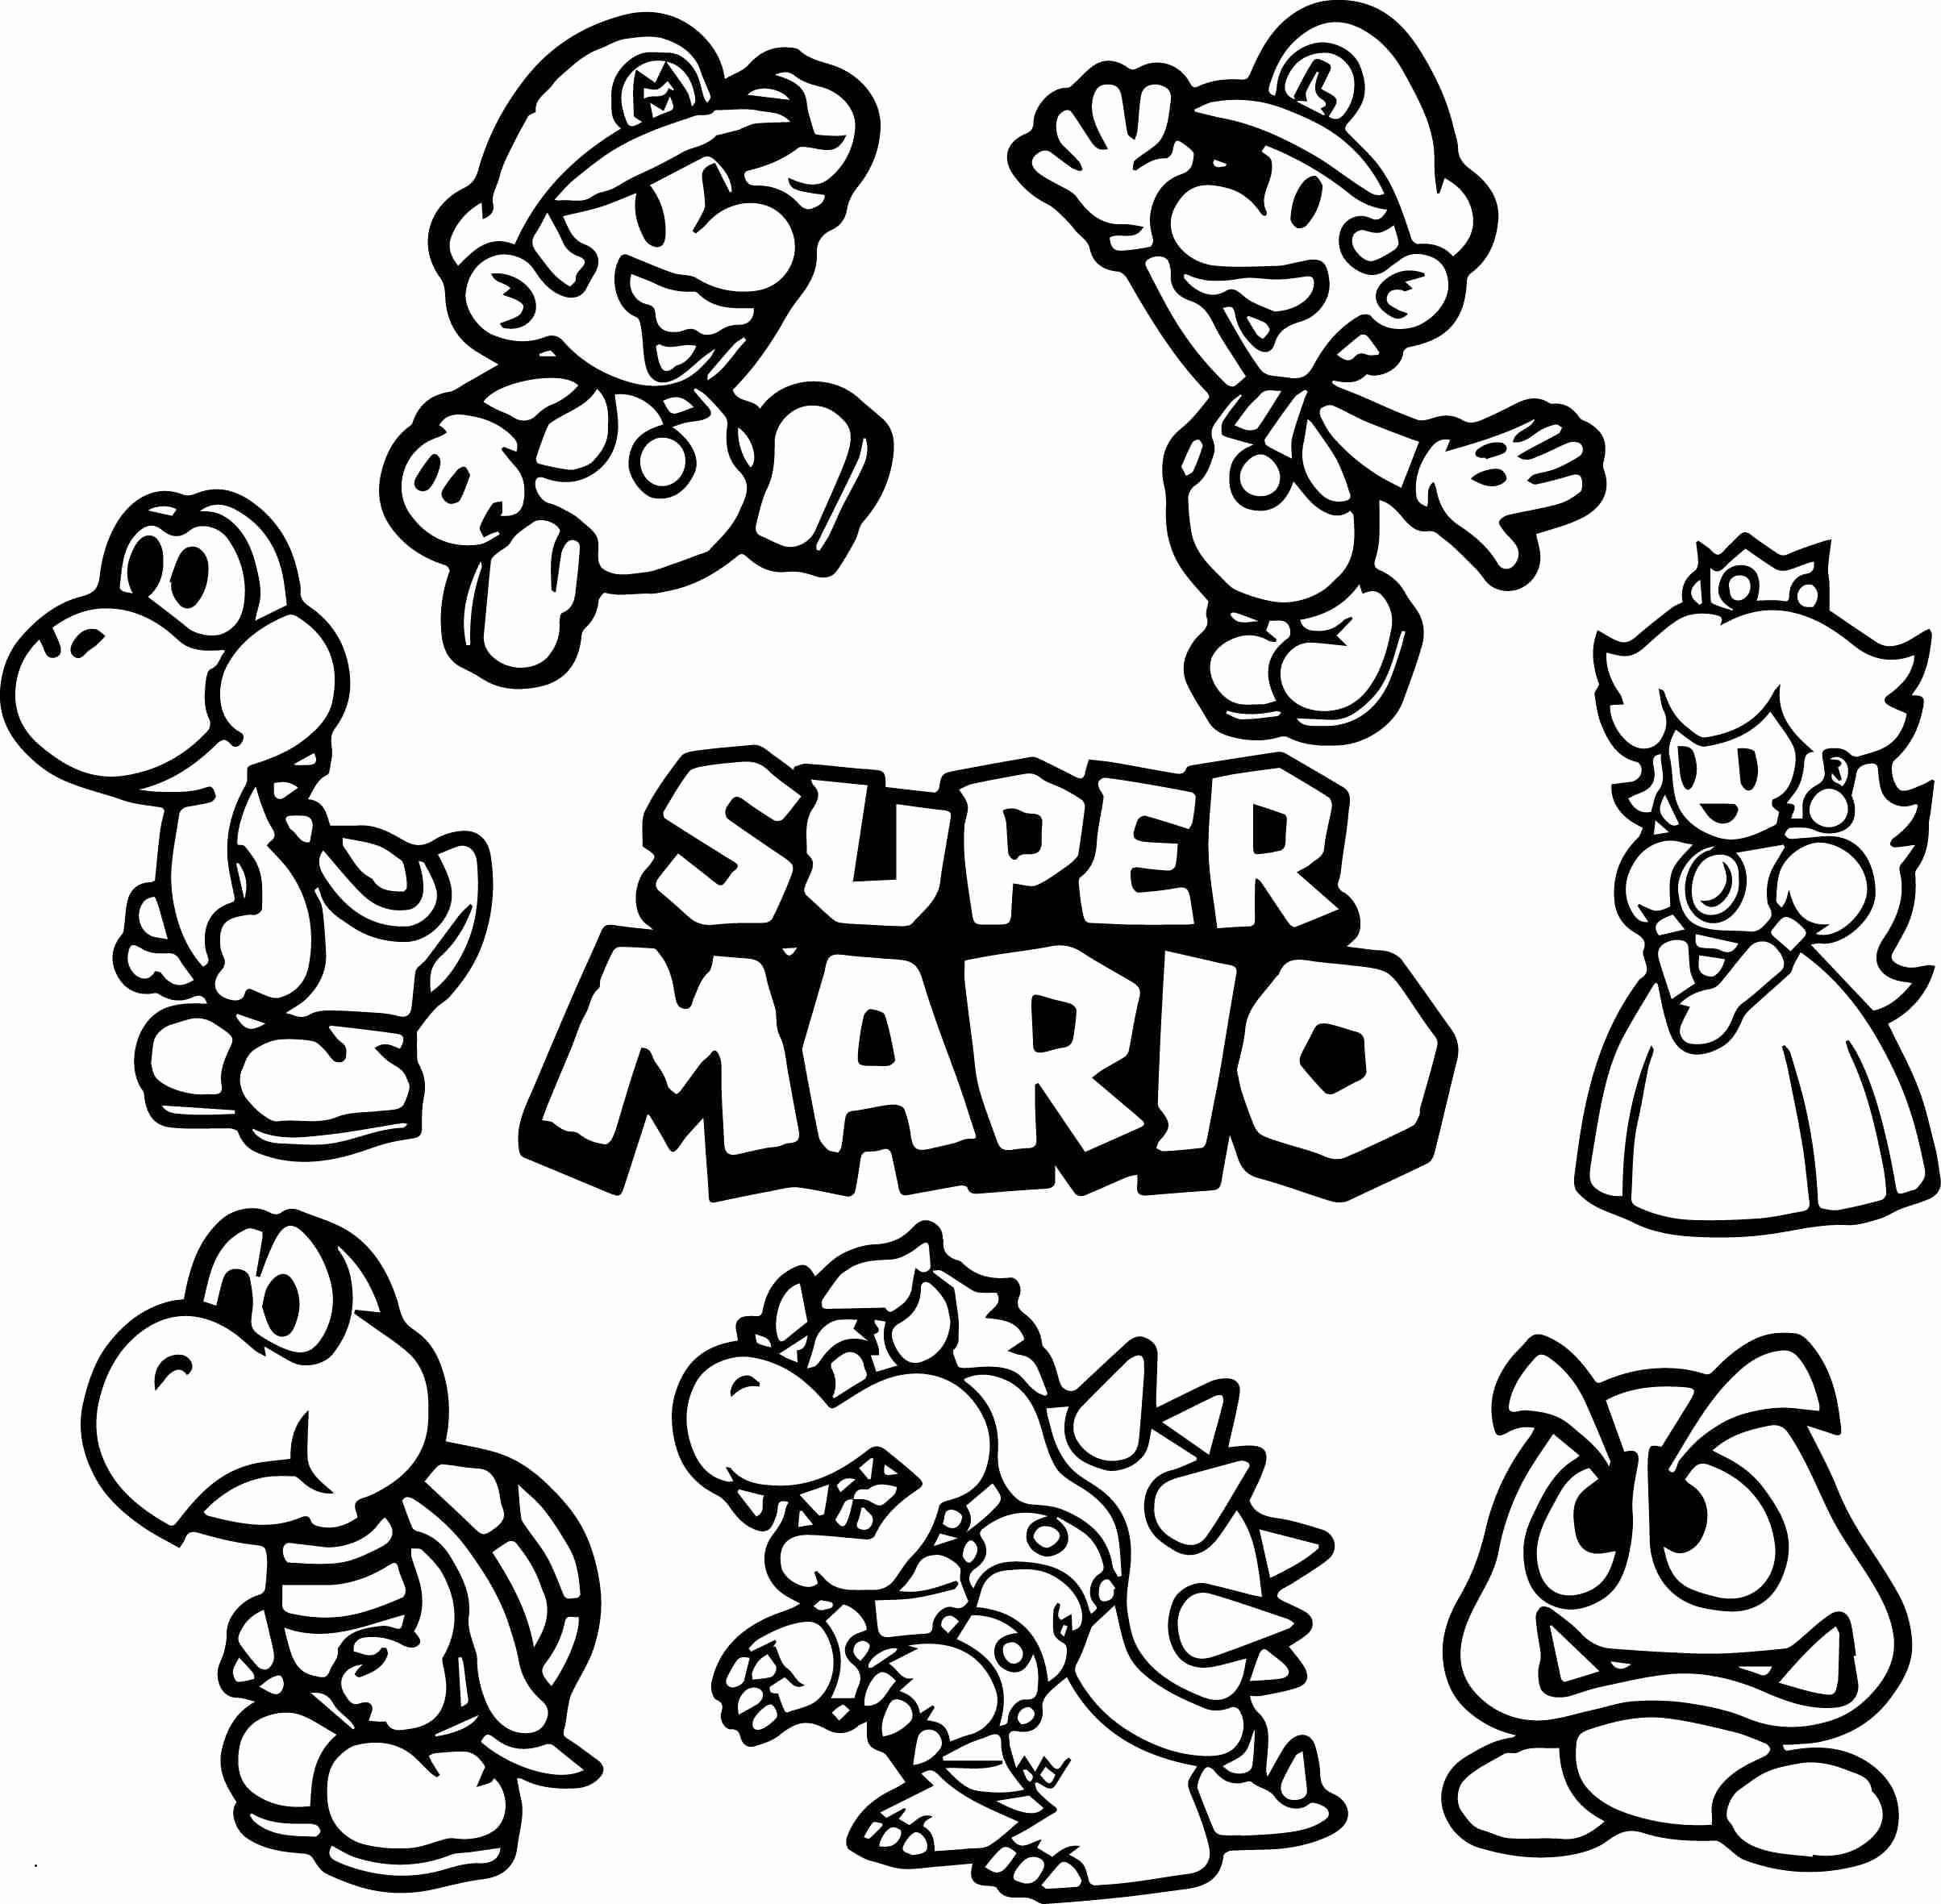 Coloriage Super Wings Für Kinder Ausmalbilder Super Mario